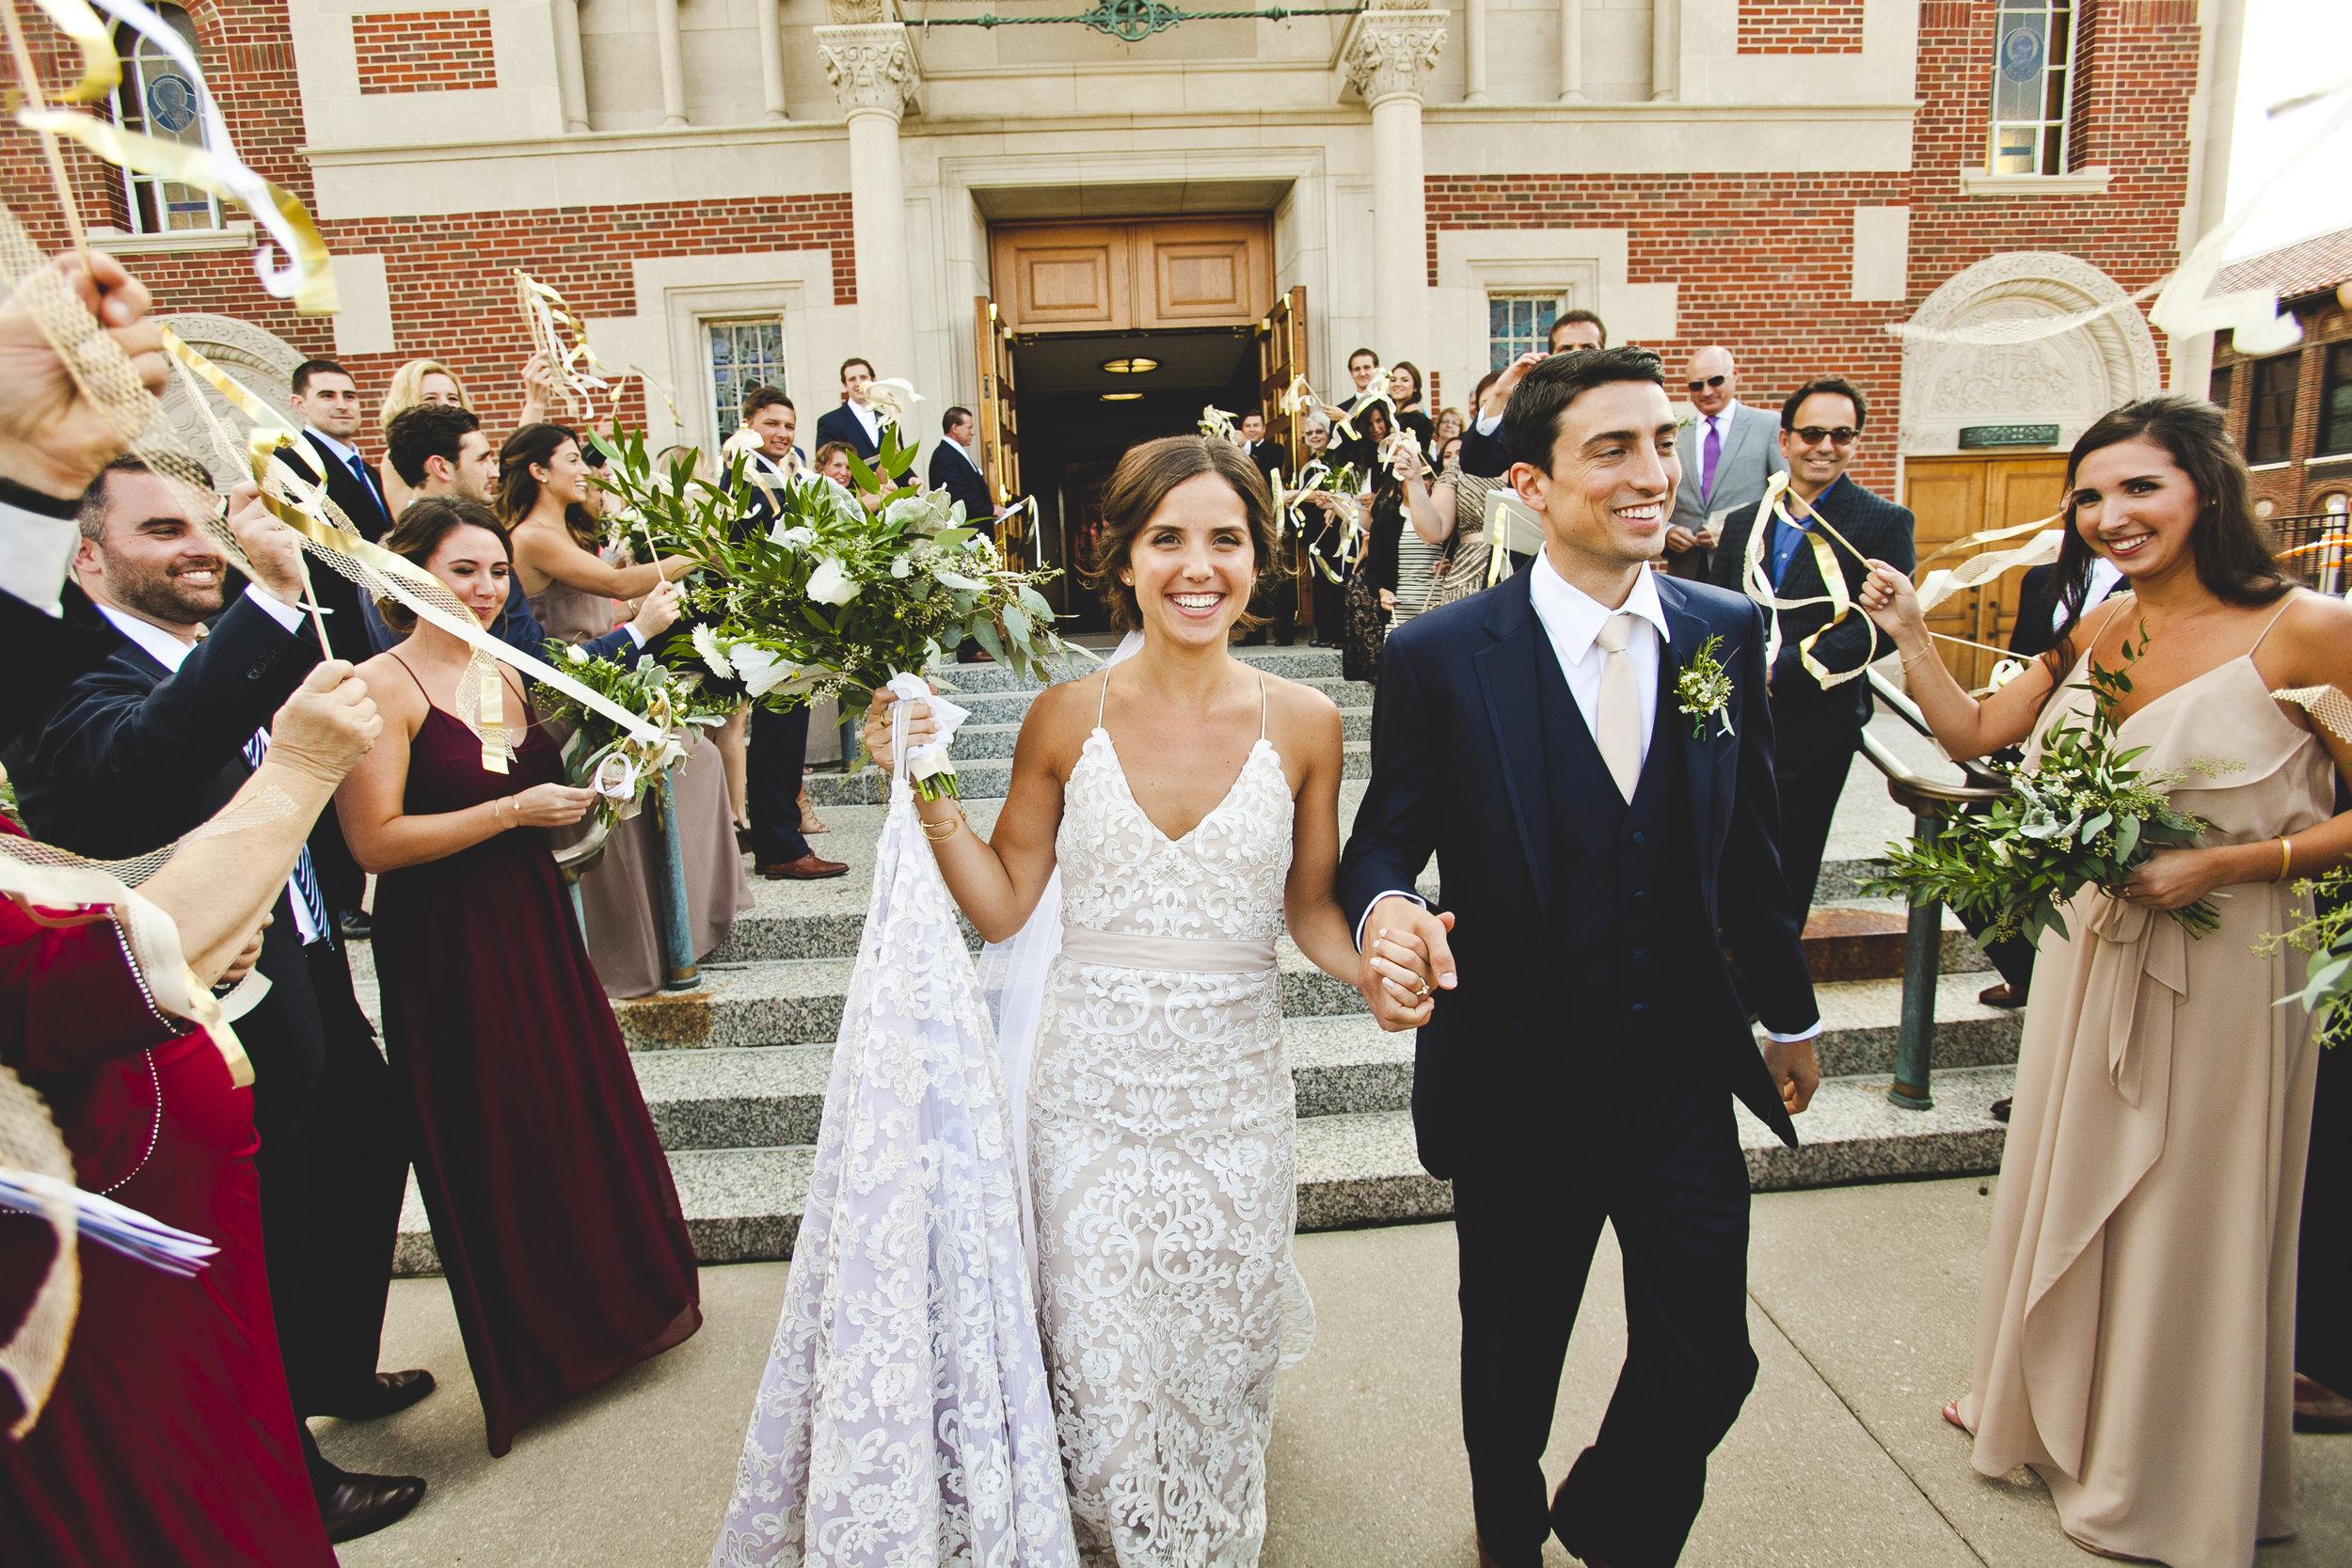 AndreaCharlie Wedding_0496.JPG